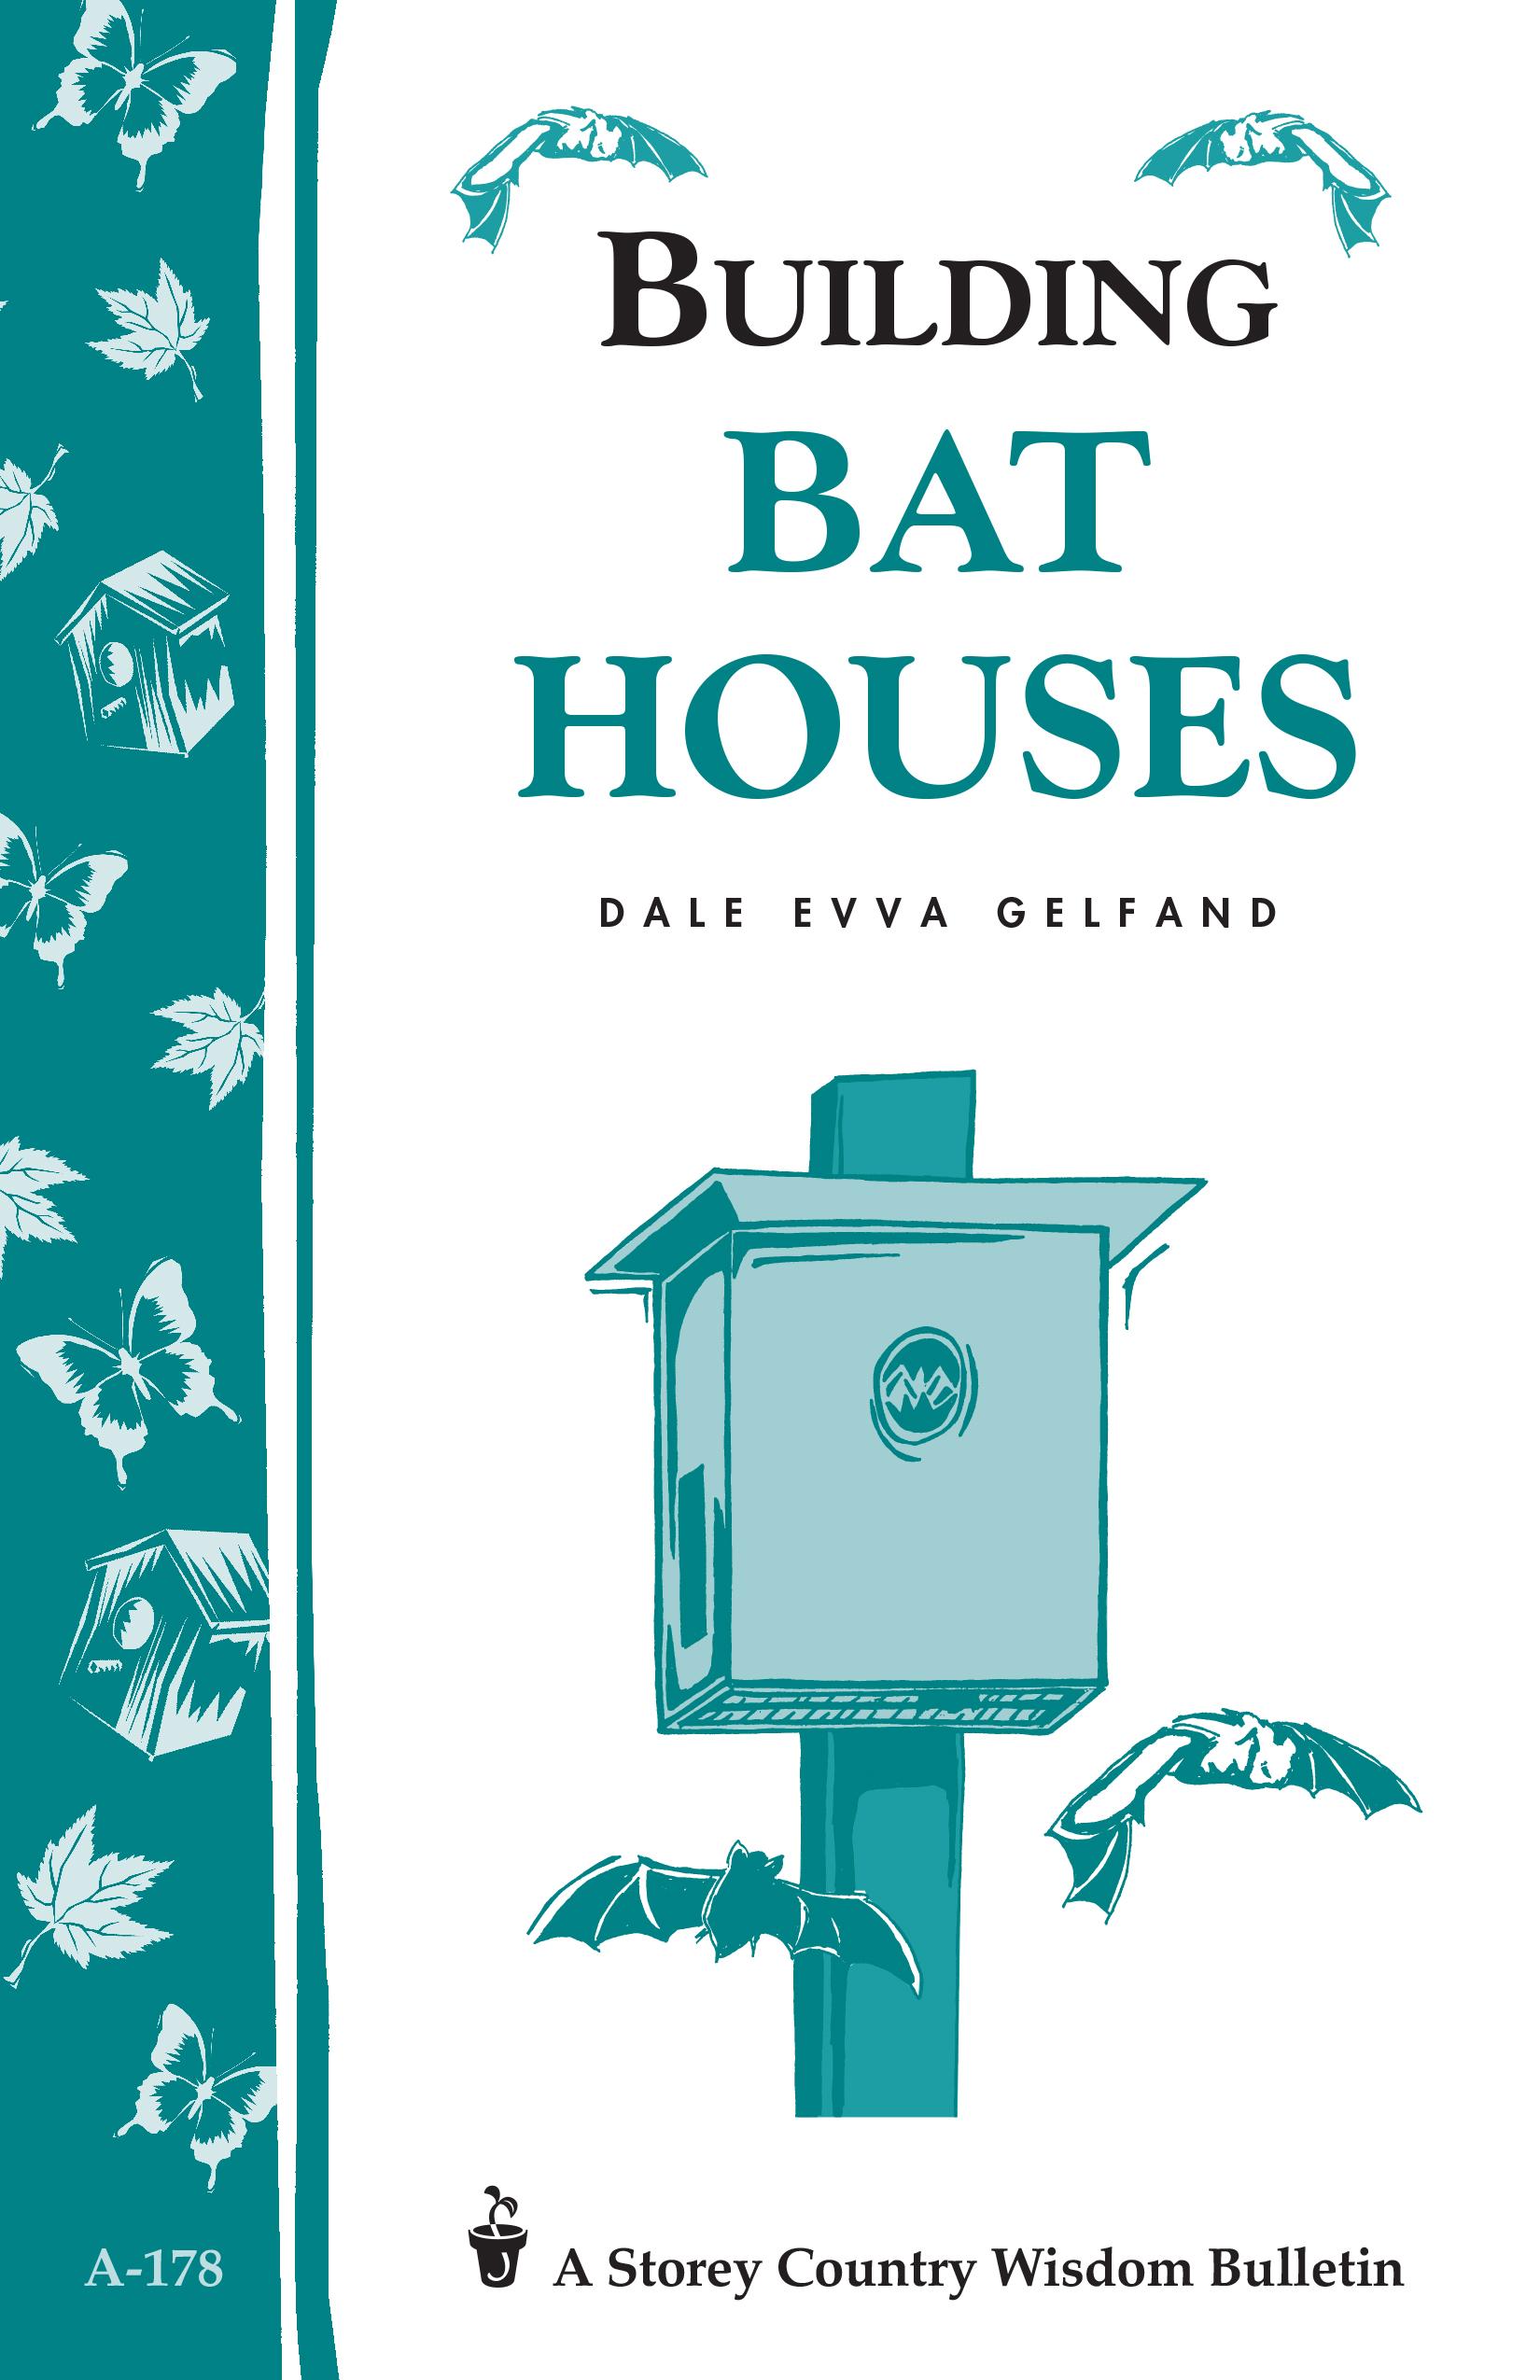 Building Bat Houses Storey's Country Wisdom Bulletin A-178 - Dale Evva Gelfand